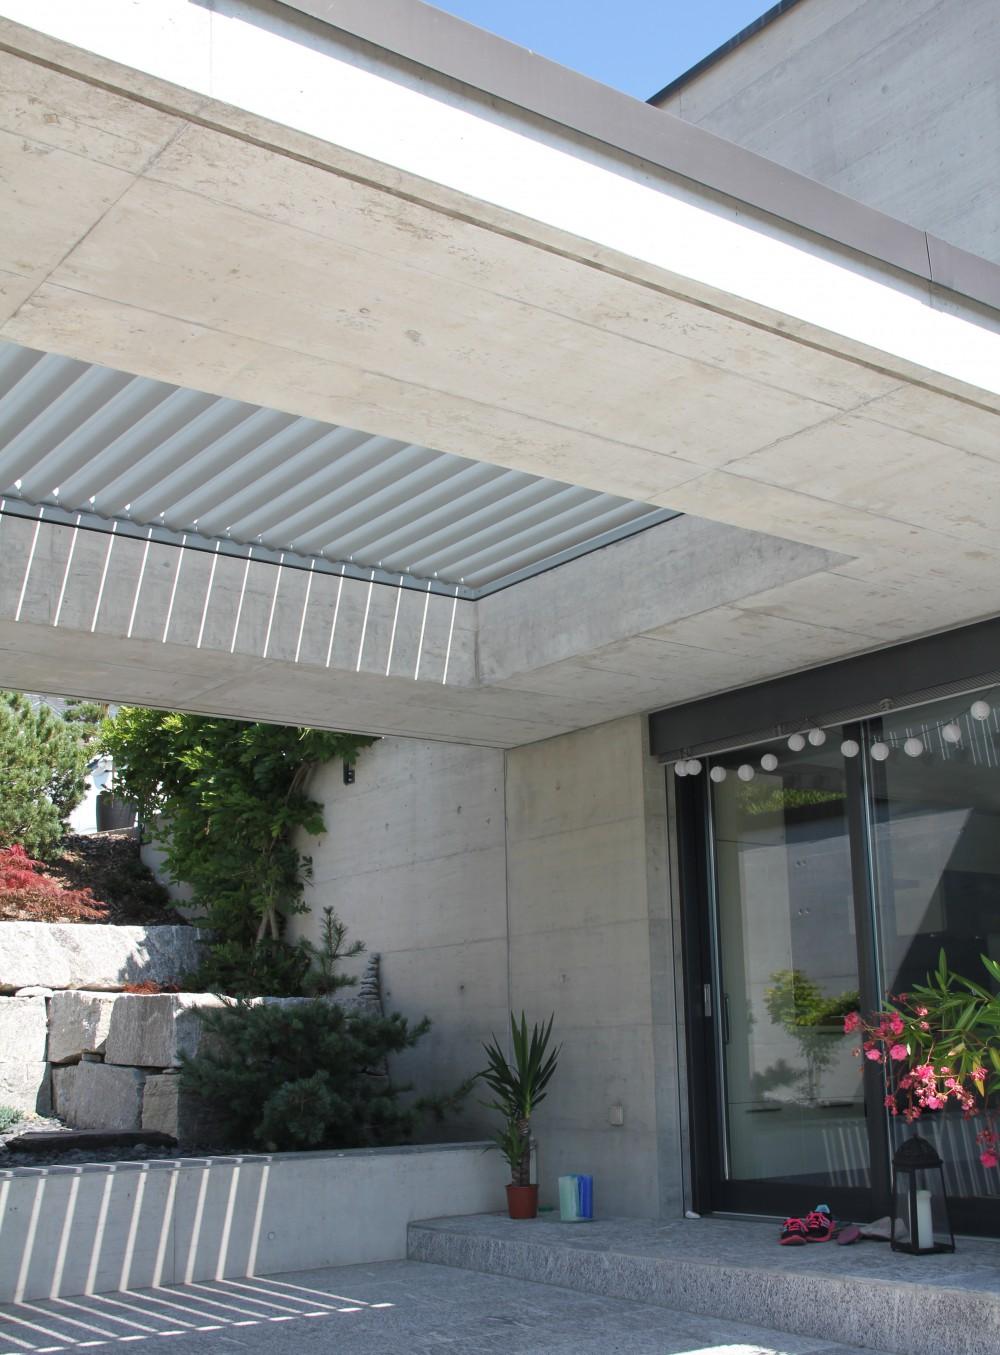 Villa-a-tavannes-46-1401-7